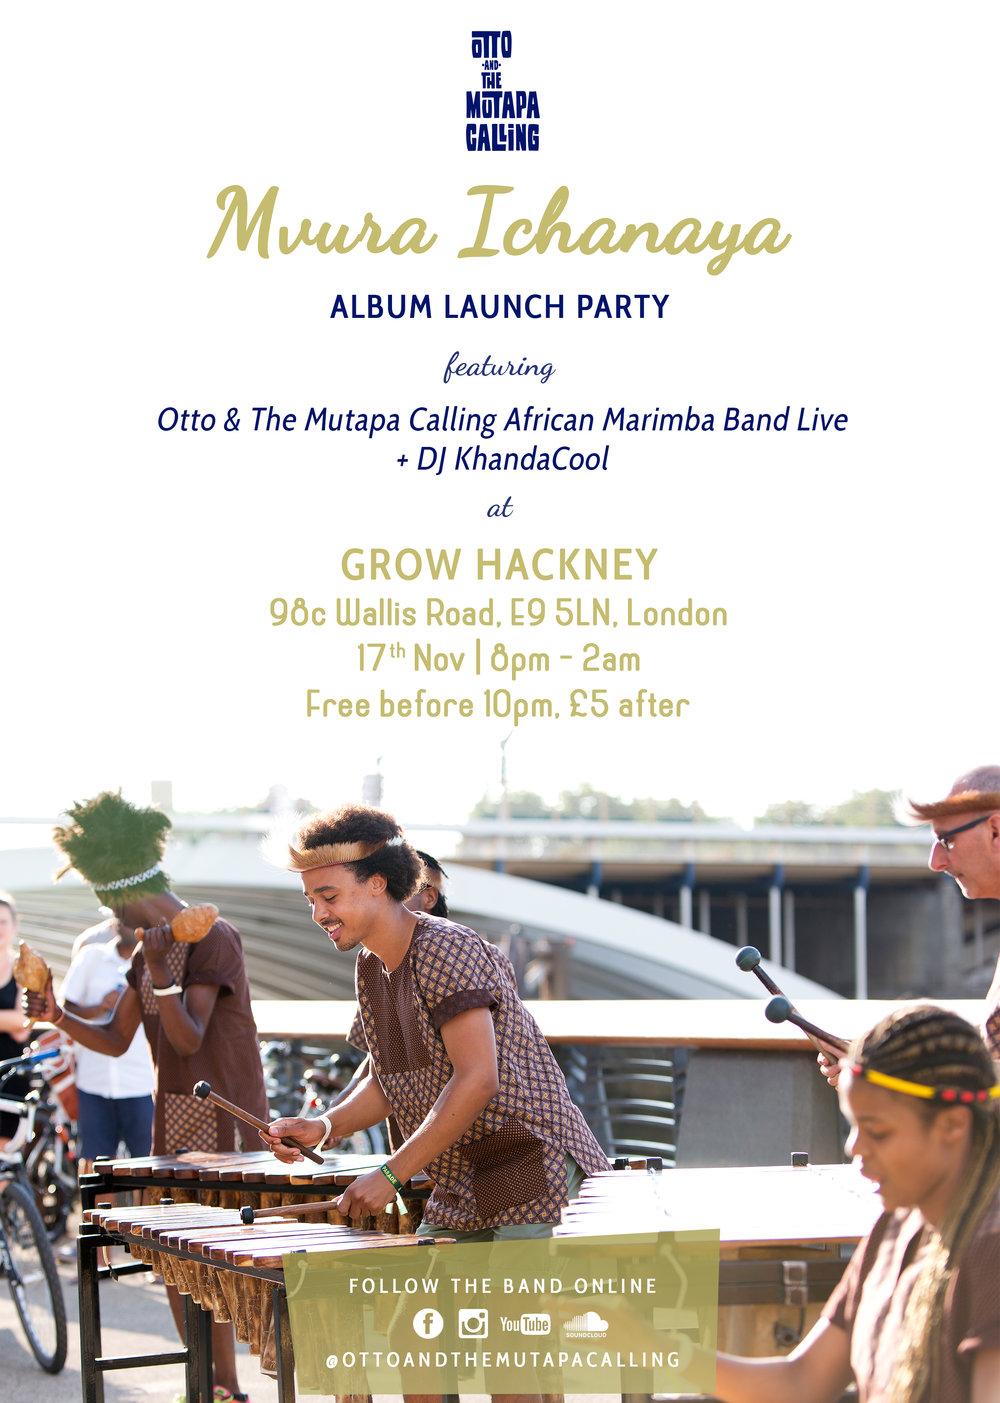 Otto And The Mutapa Calling Marimba Band Mvura Ichanaya Album Launch Party